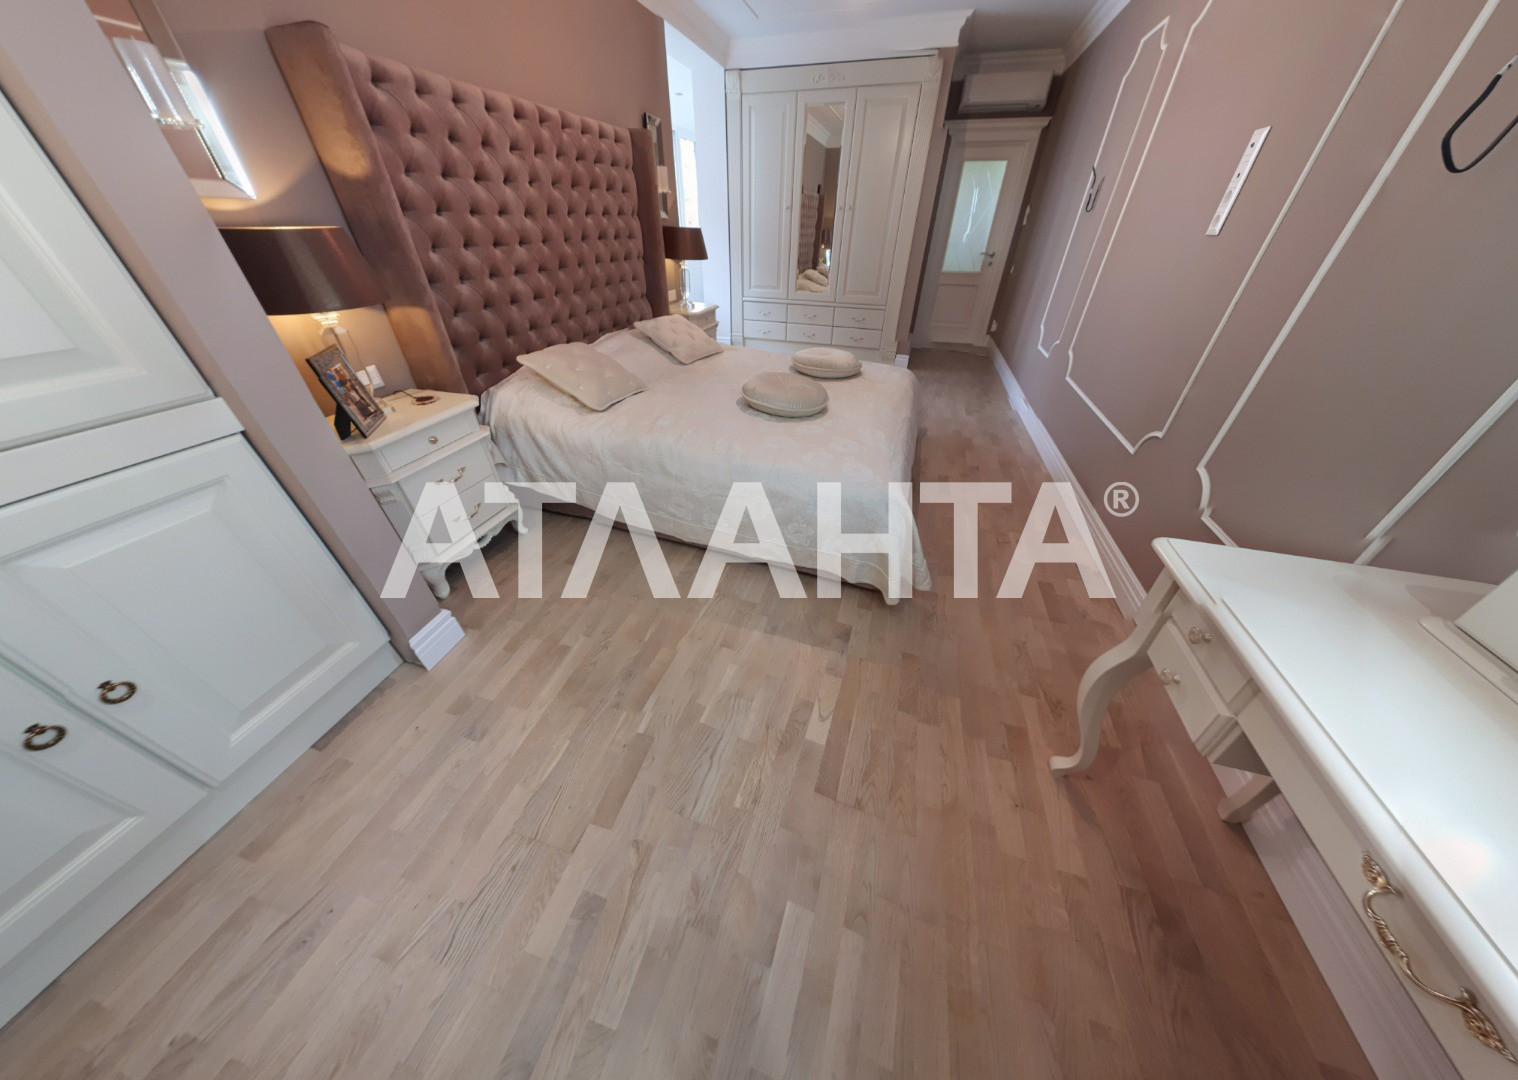 Продается 3-комнатная Квартира на ул. Ул. Ломоносова — 230 000 у.е. (фото №20)